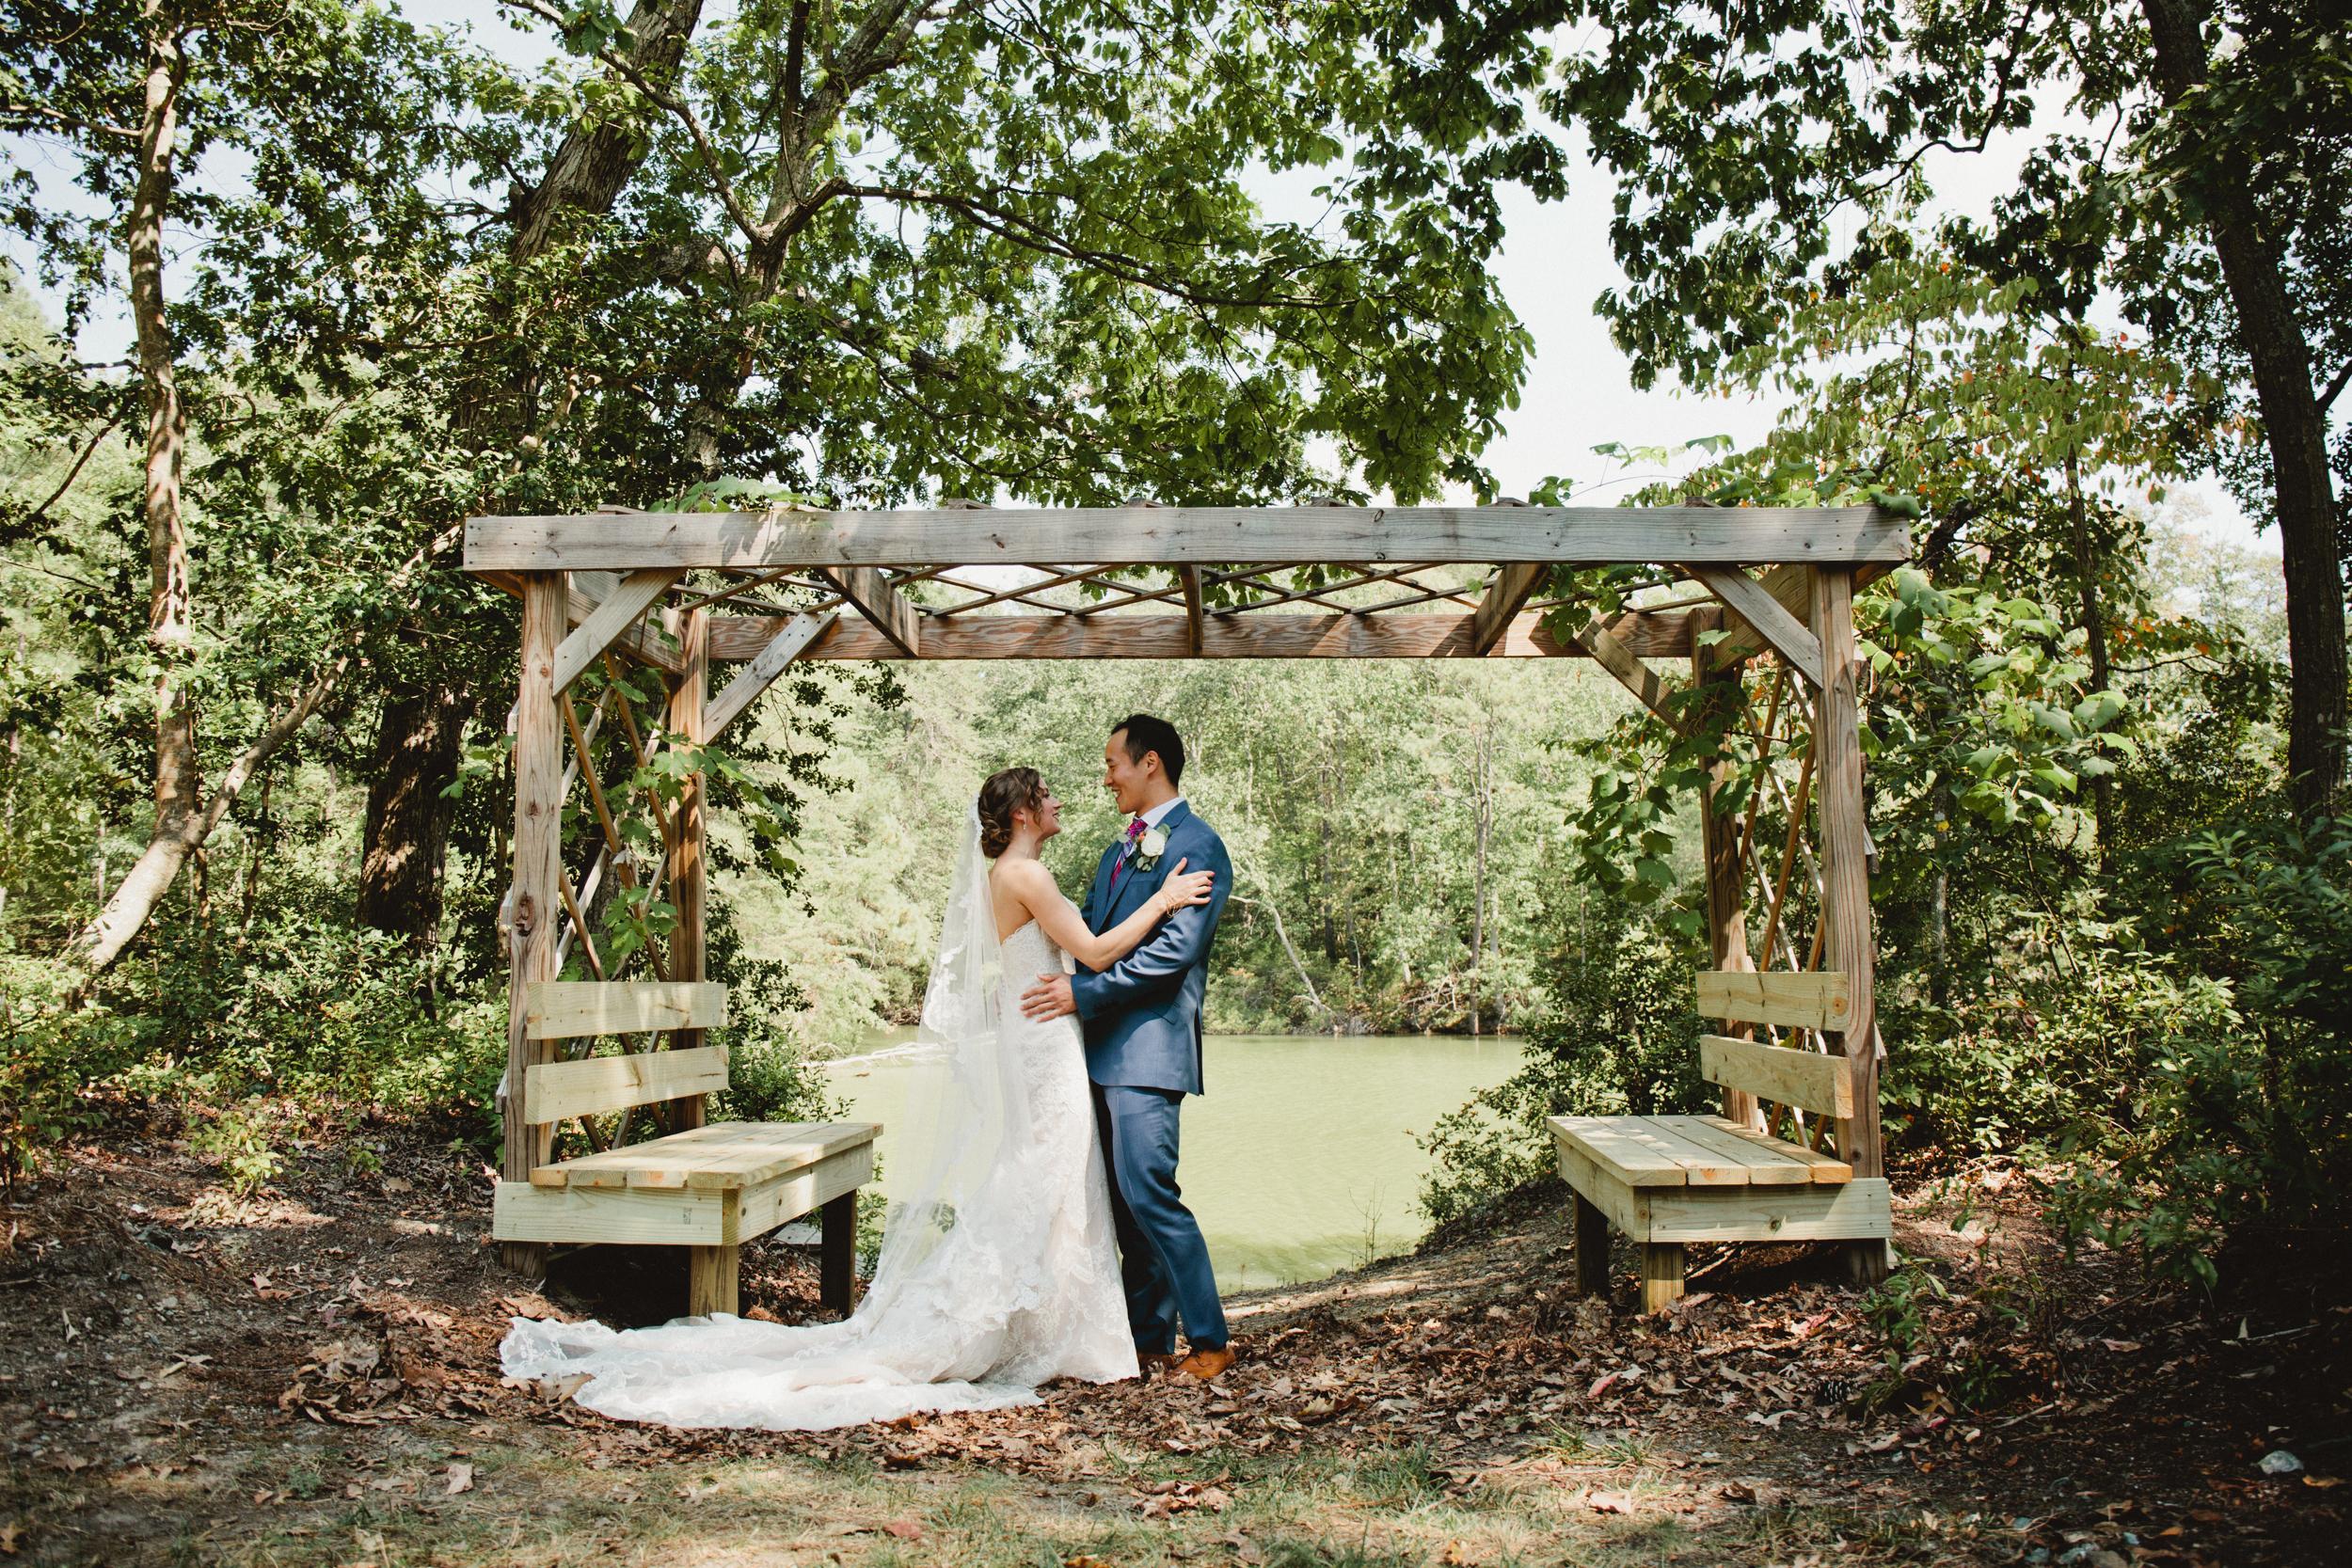 Maine-Wedding-Photographer-959.jpg